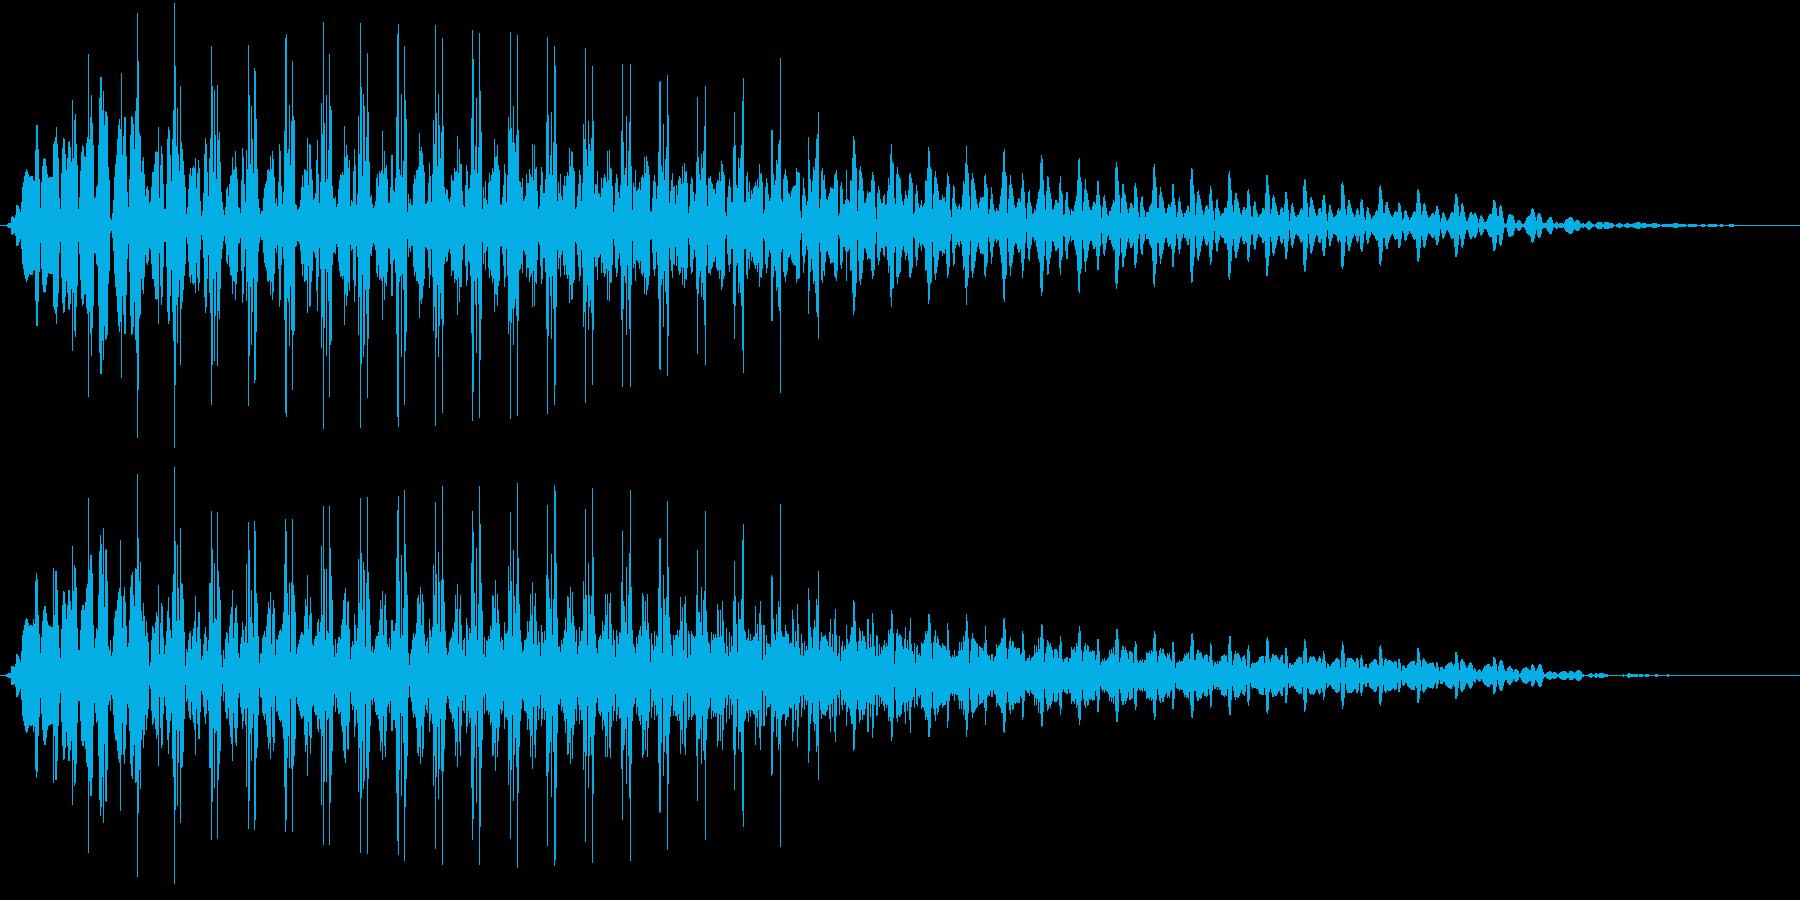 Beam ライトセーバー風 ブォーン音の再生済みの波形